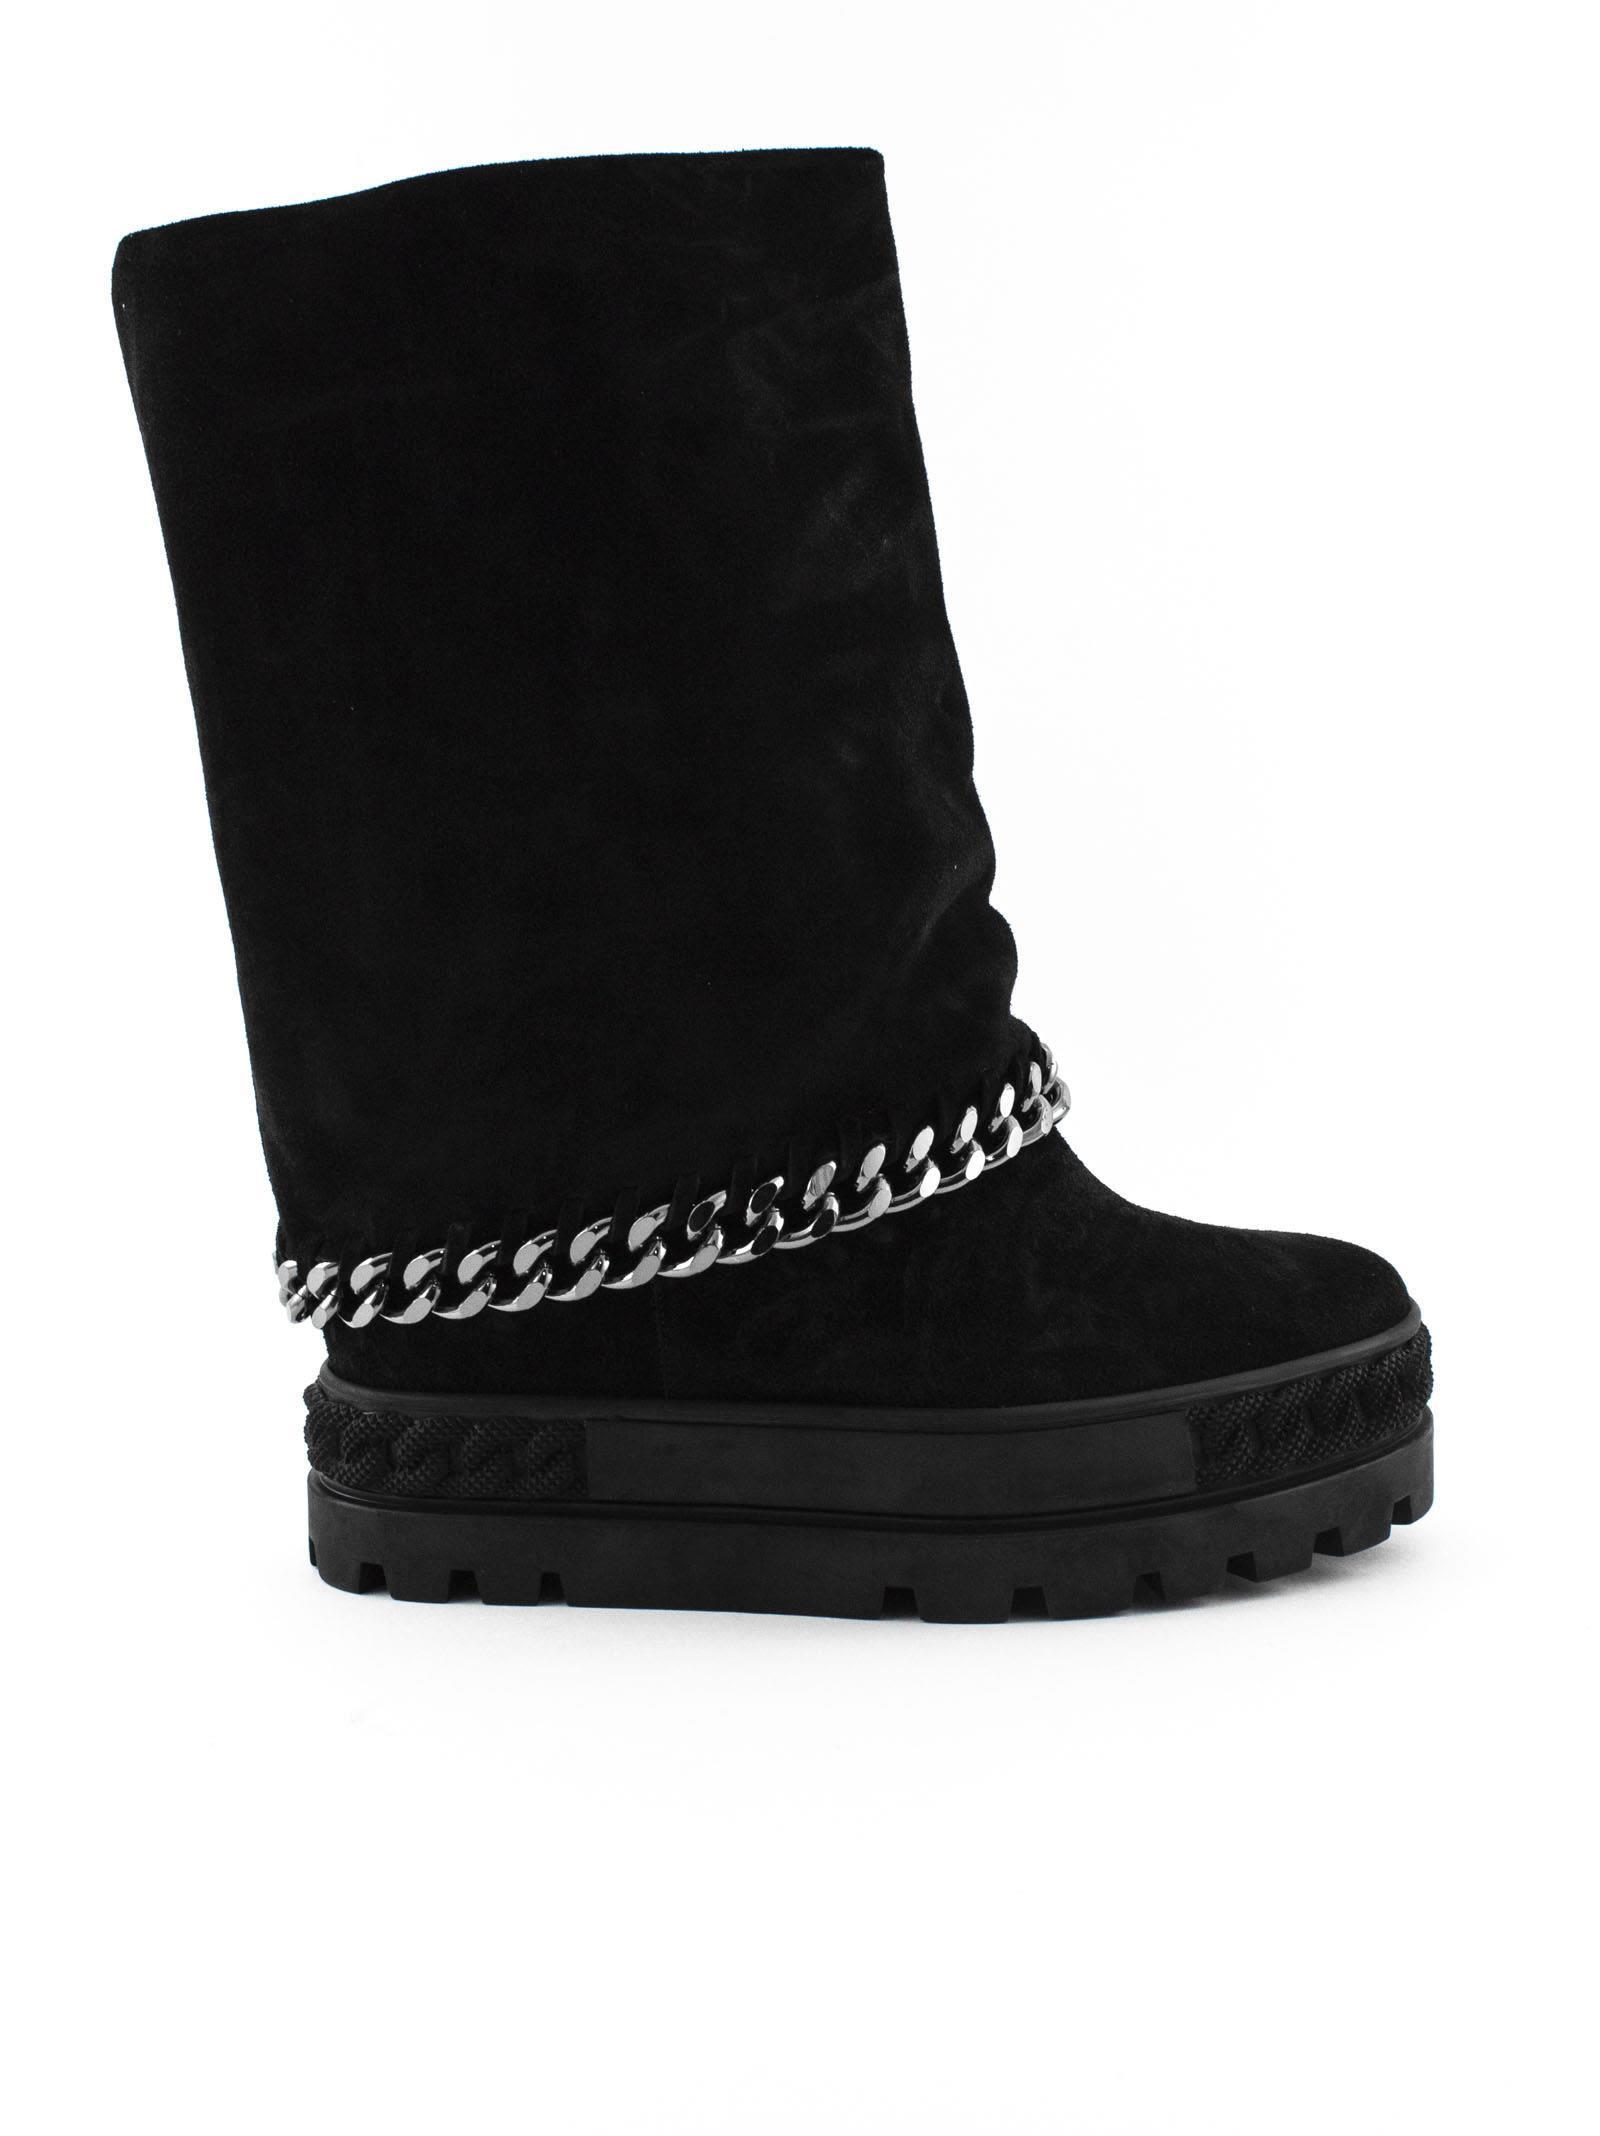 Reversable Sneaker In Black Suede. in Nero